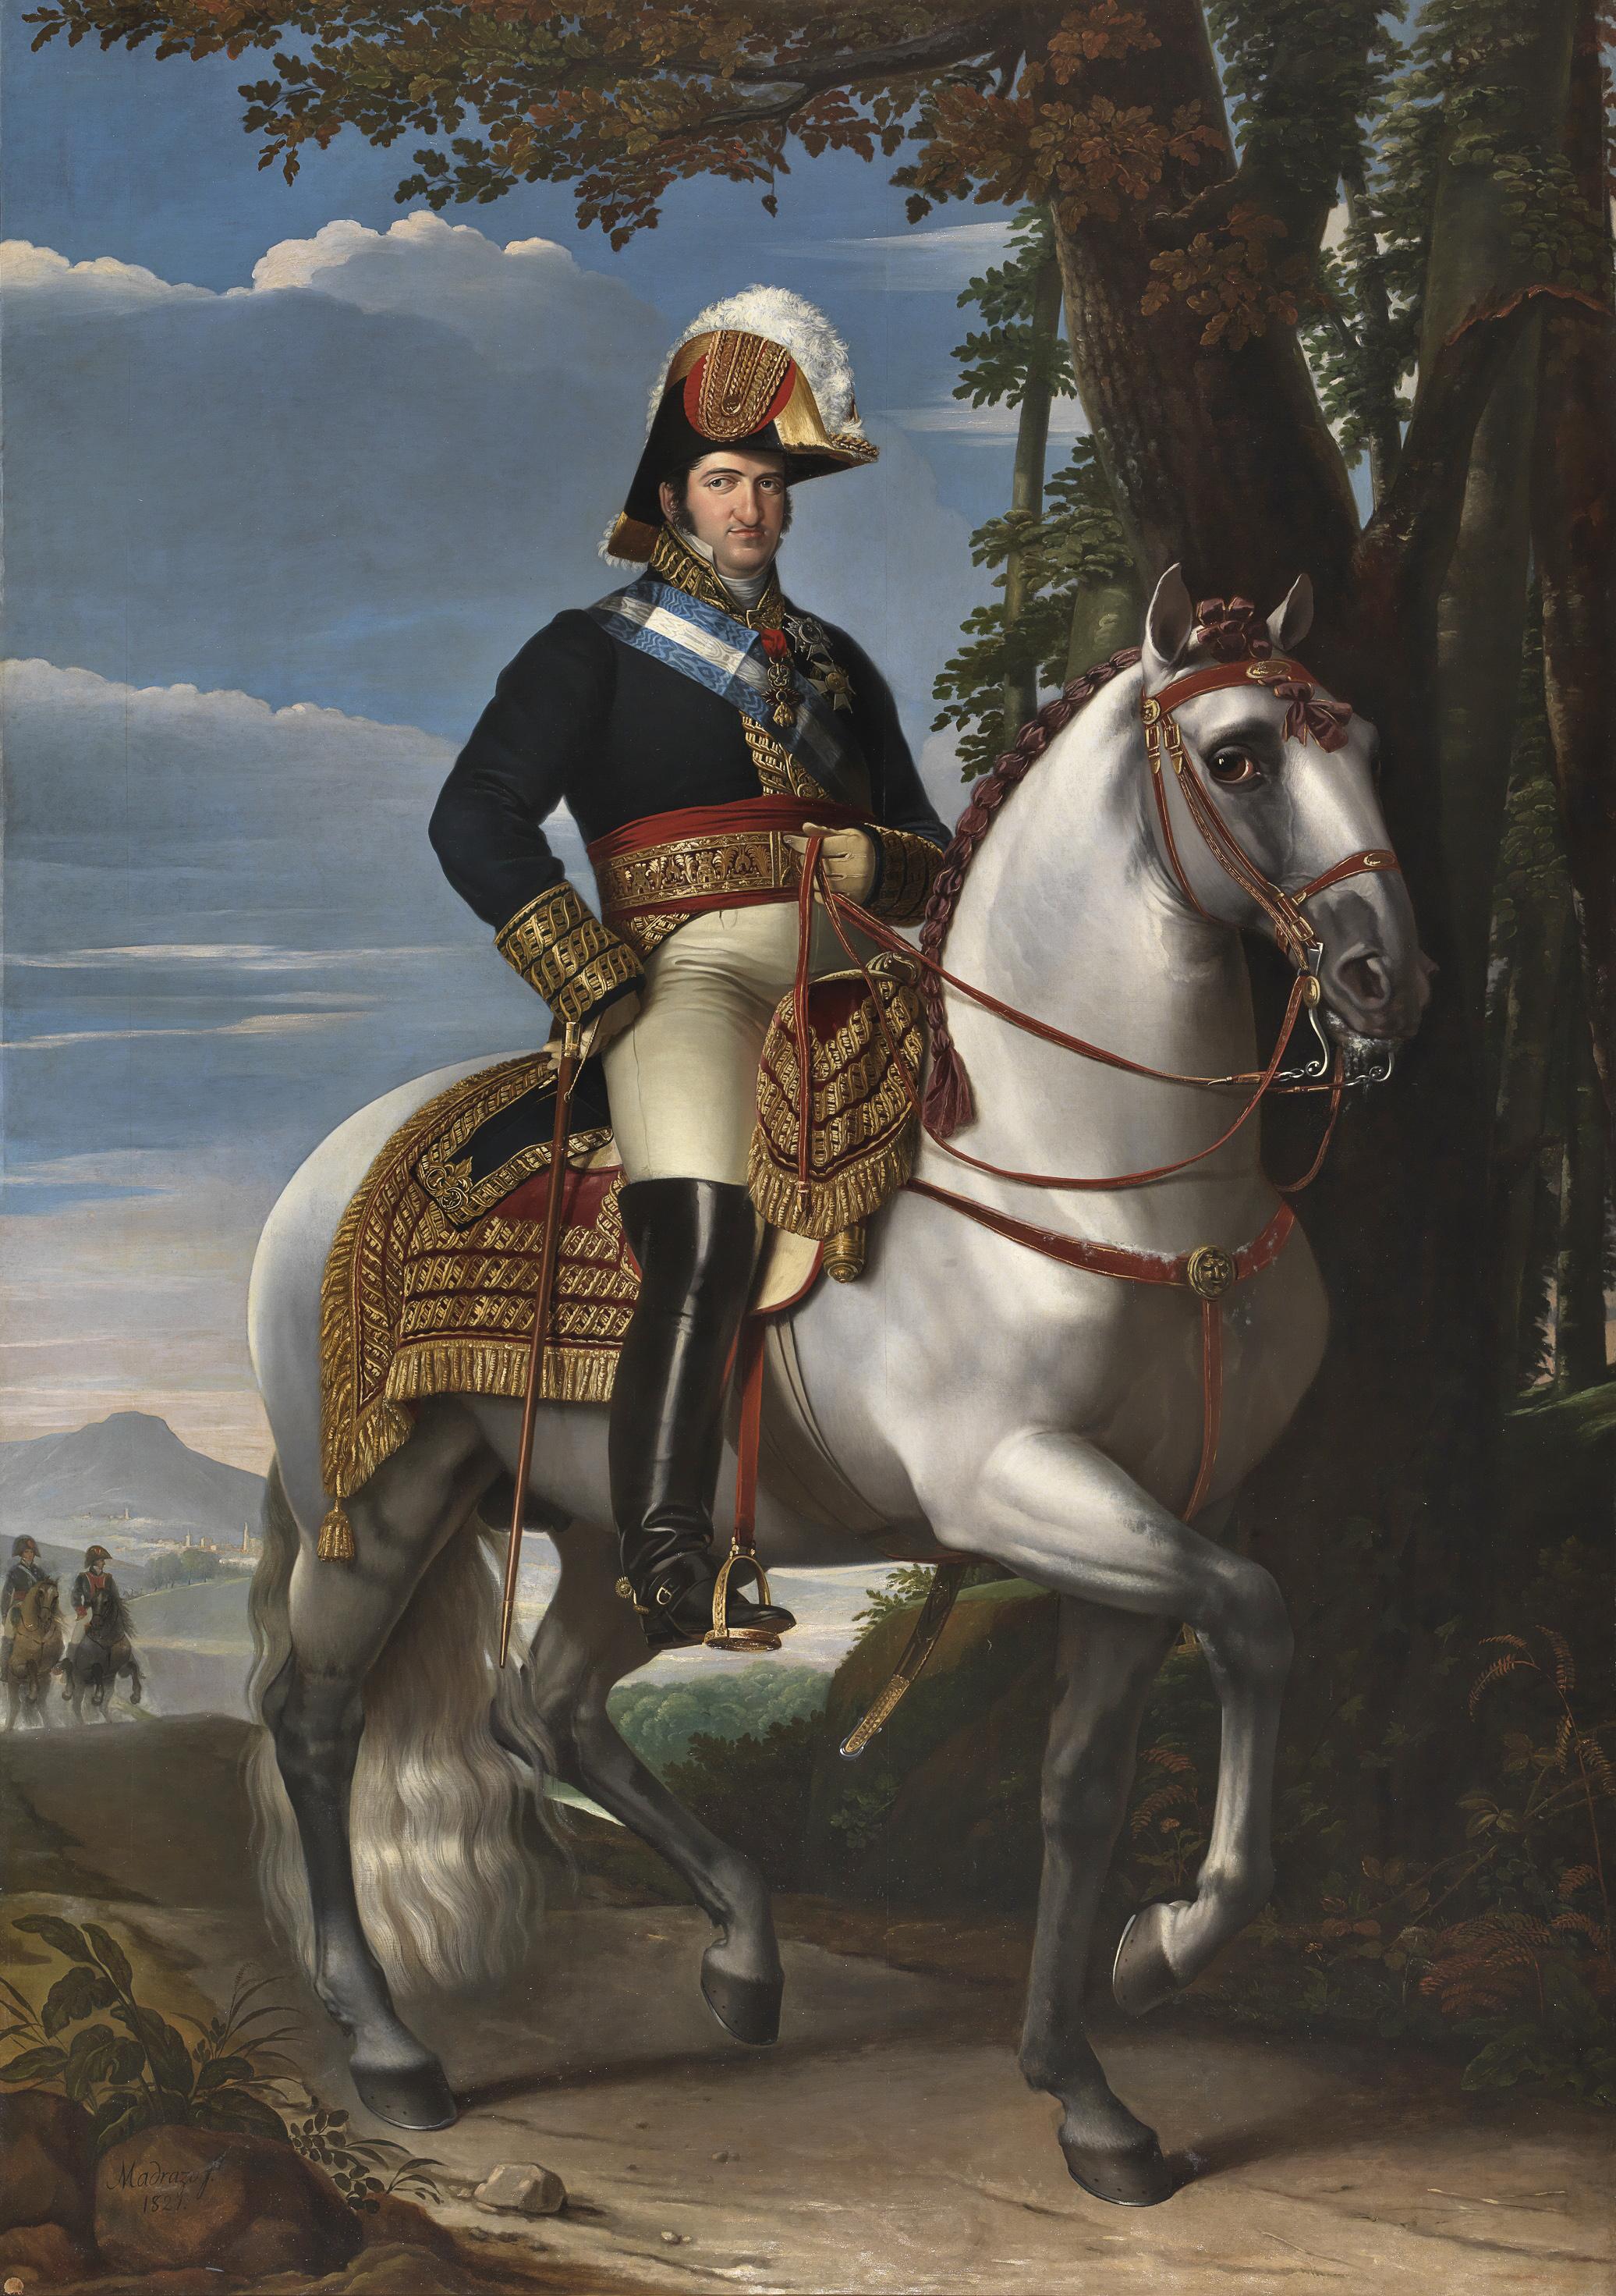 https://upload.wikimedia.org/wikipedia/commons/4/4a/Fernando_VII_a_caballo.jpg